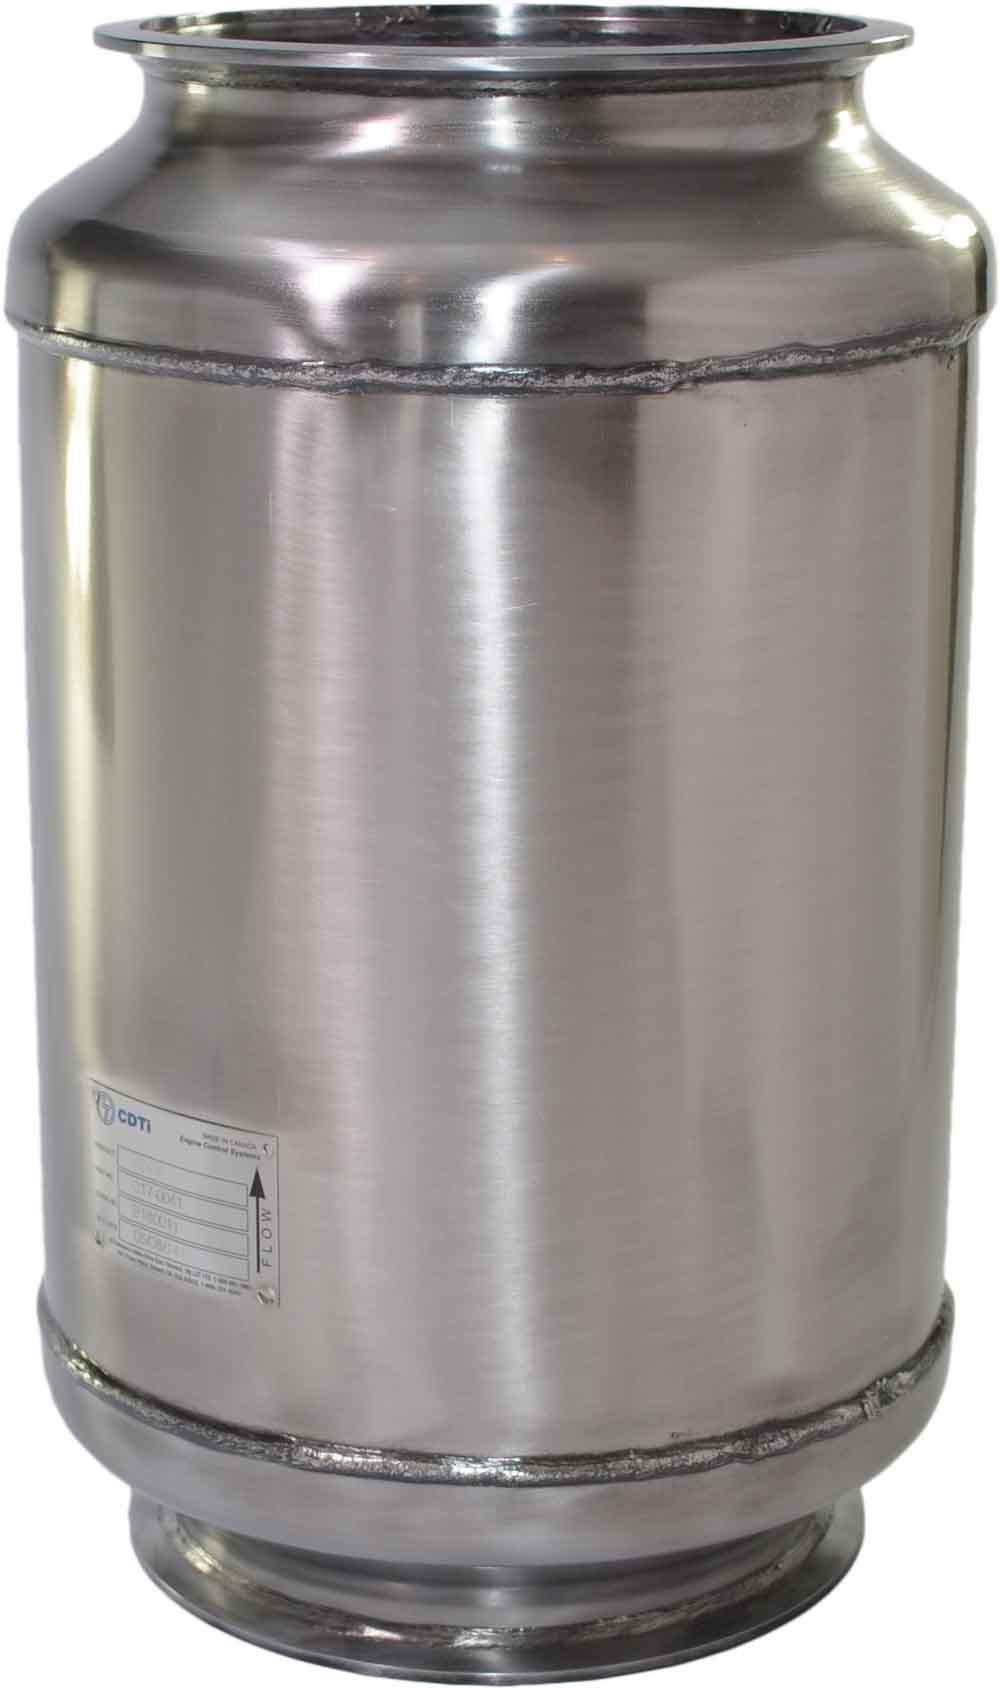 maxxforce 7 oil filters